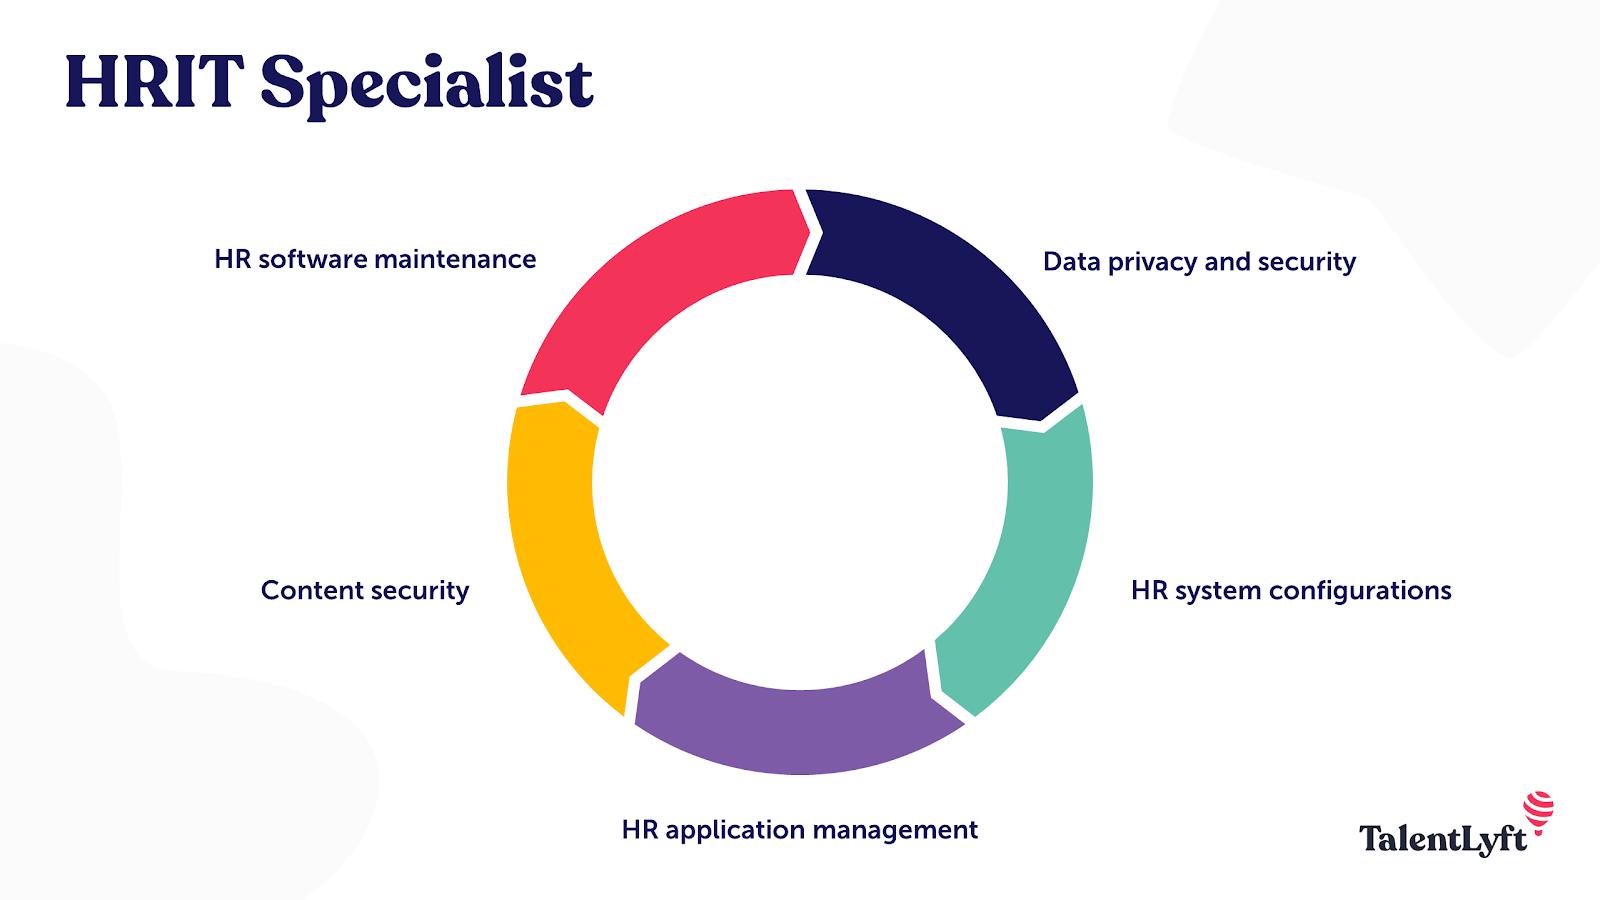 HRIT specialist future HR roles